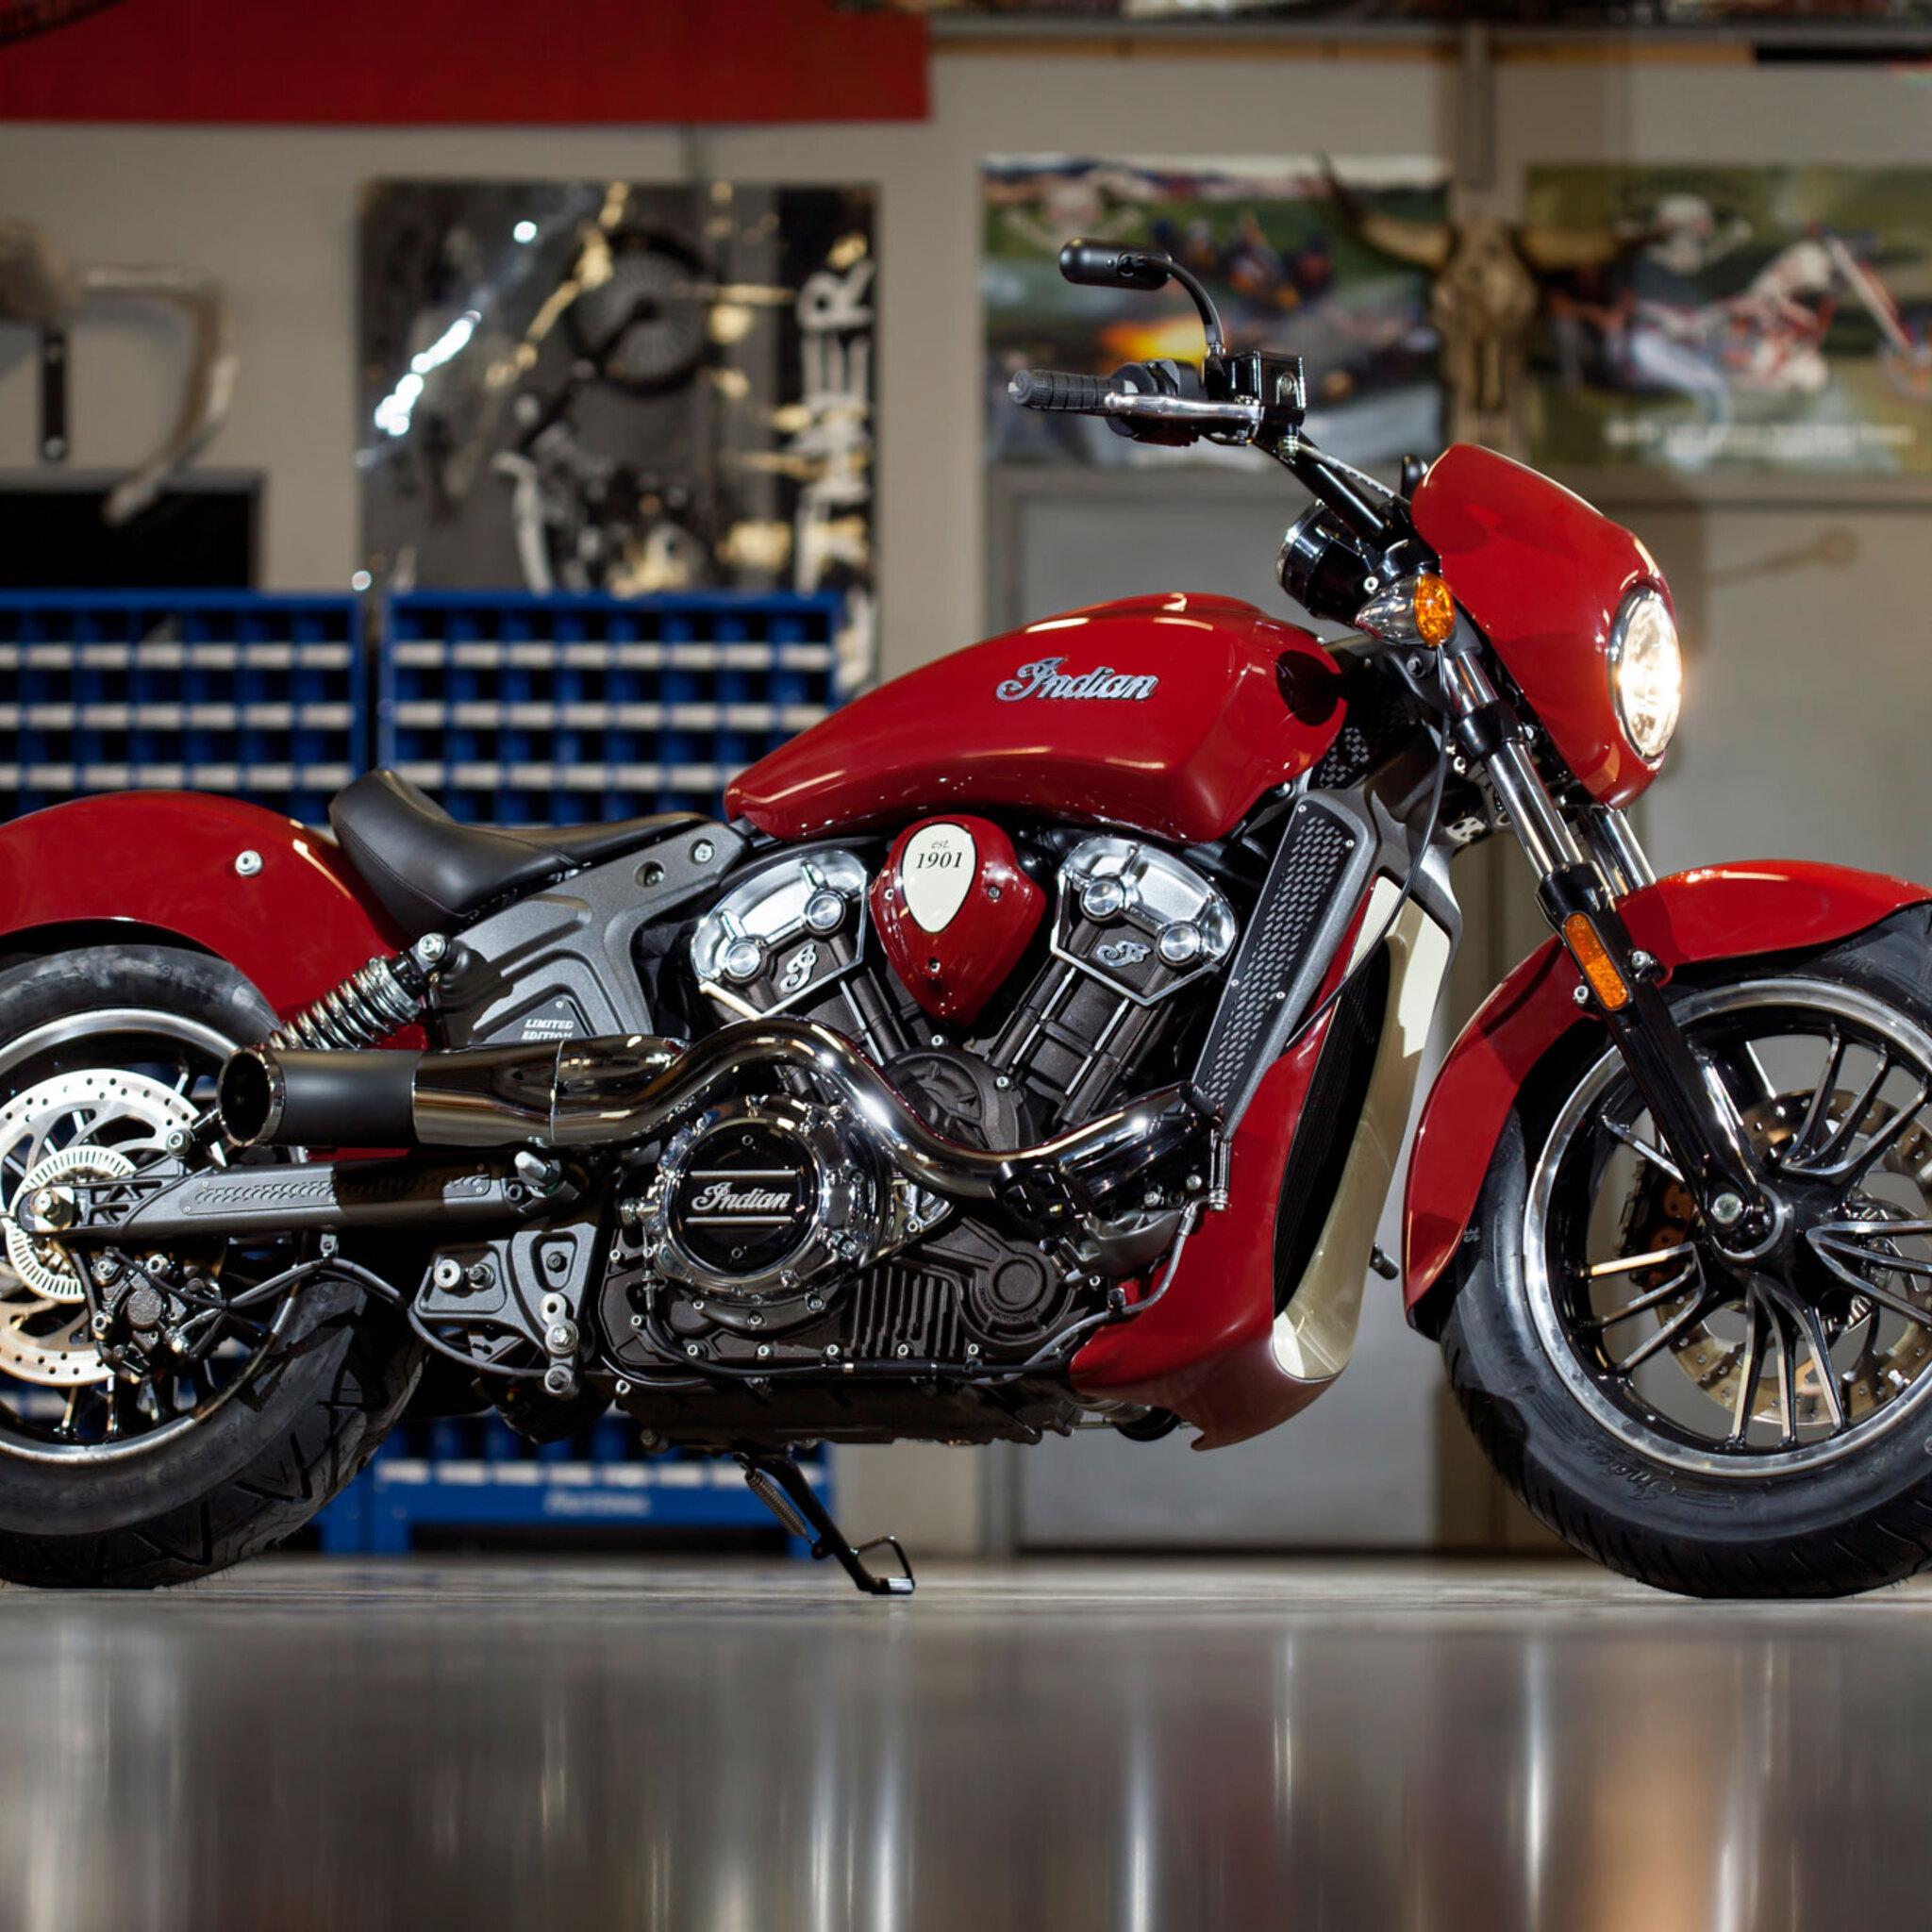 2048x2048 Hotbike Dbc 2016 Ipad Air Hd 4k Wallpapers Images